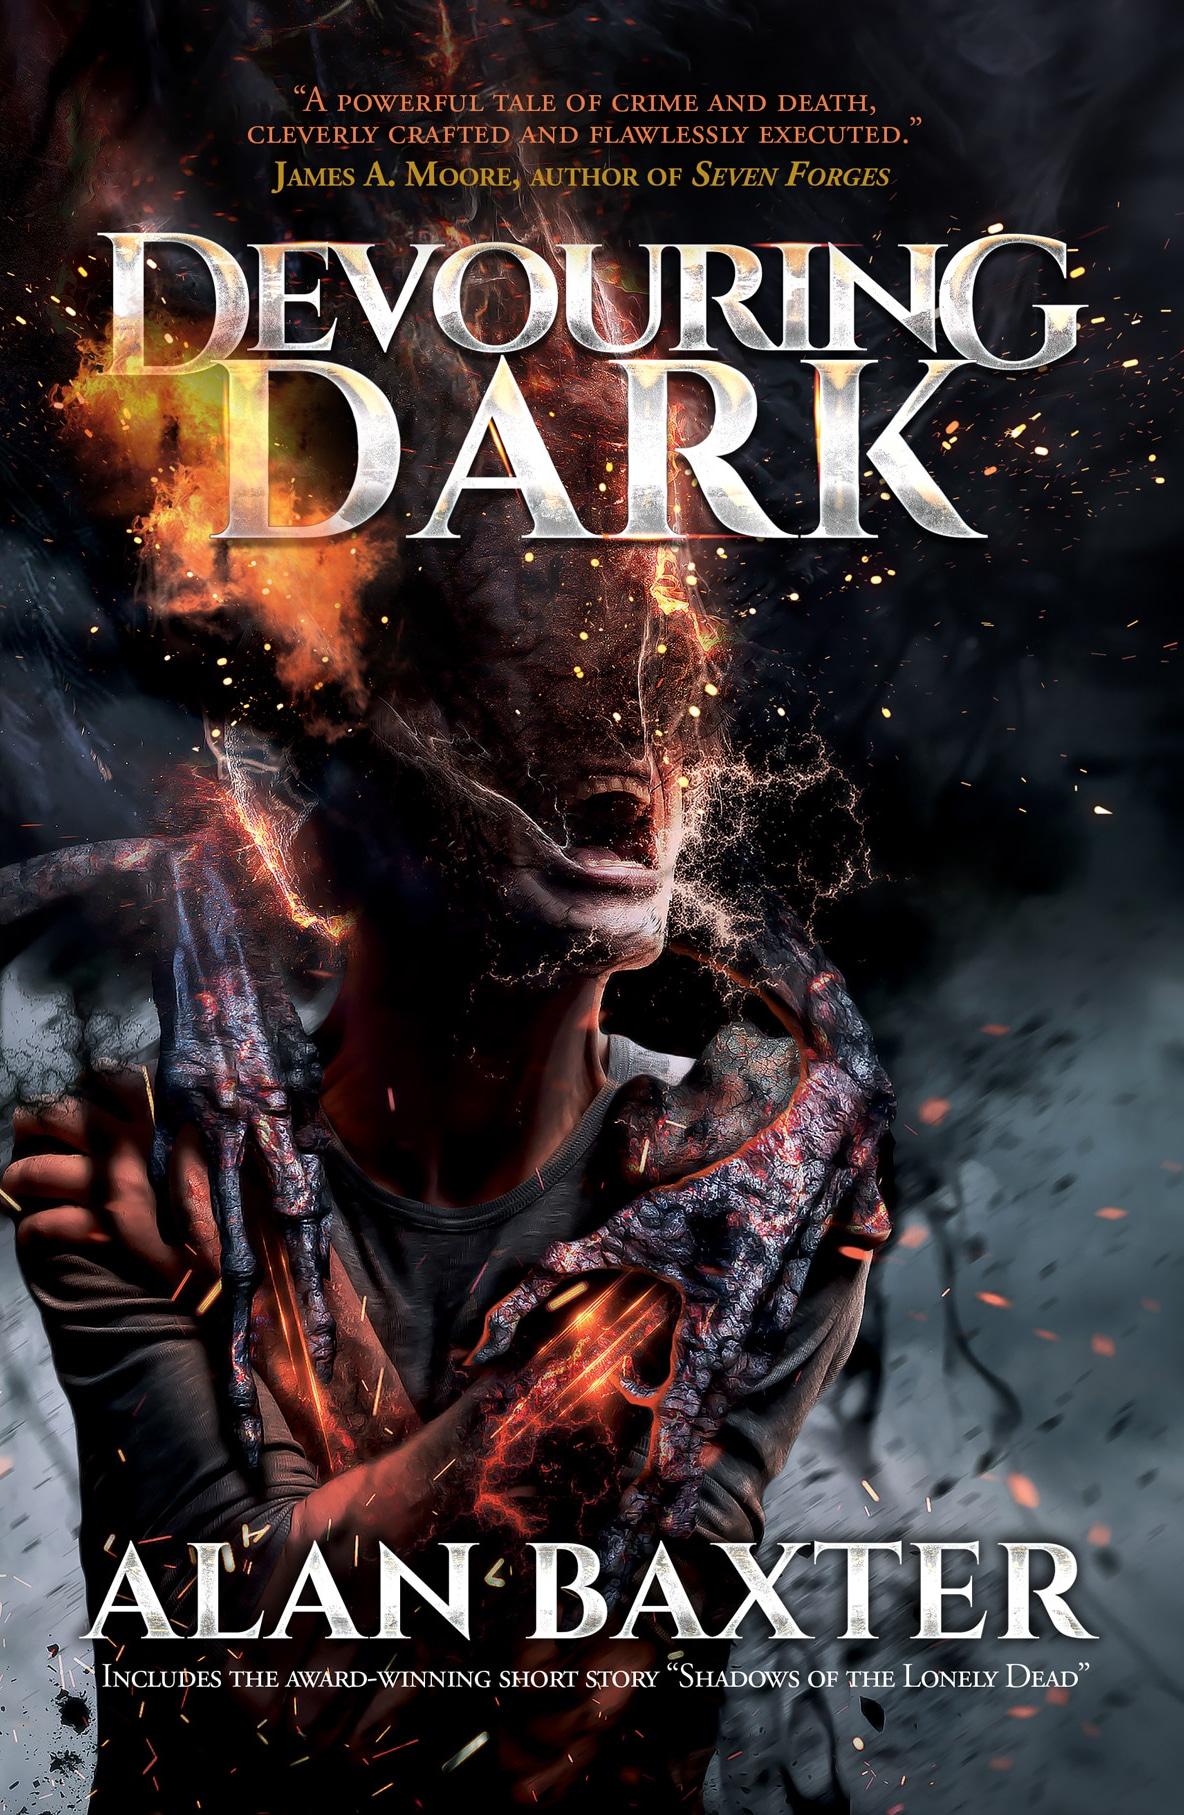 Alan baxter, author, devouring dark, horror, geek out virtual con 2020